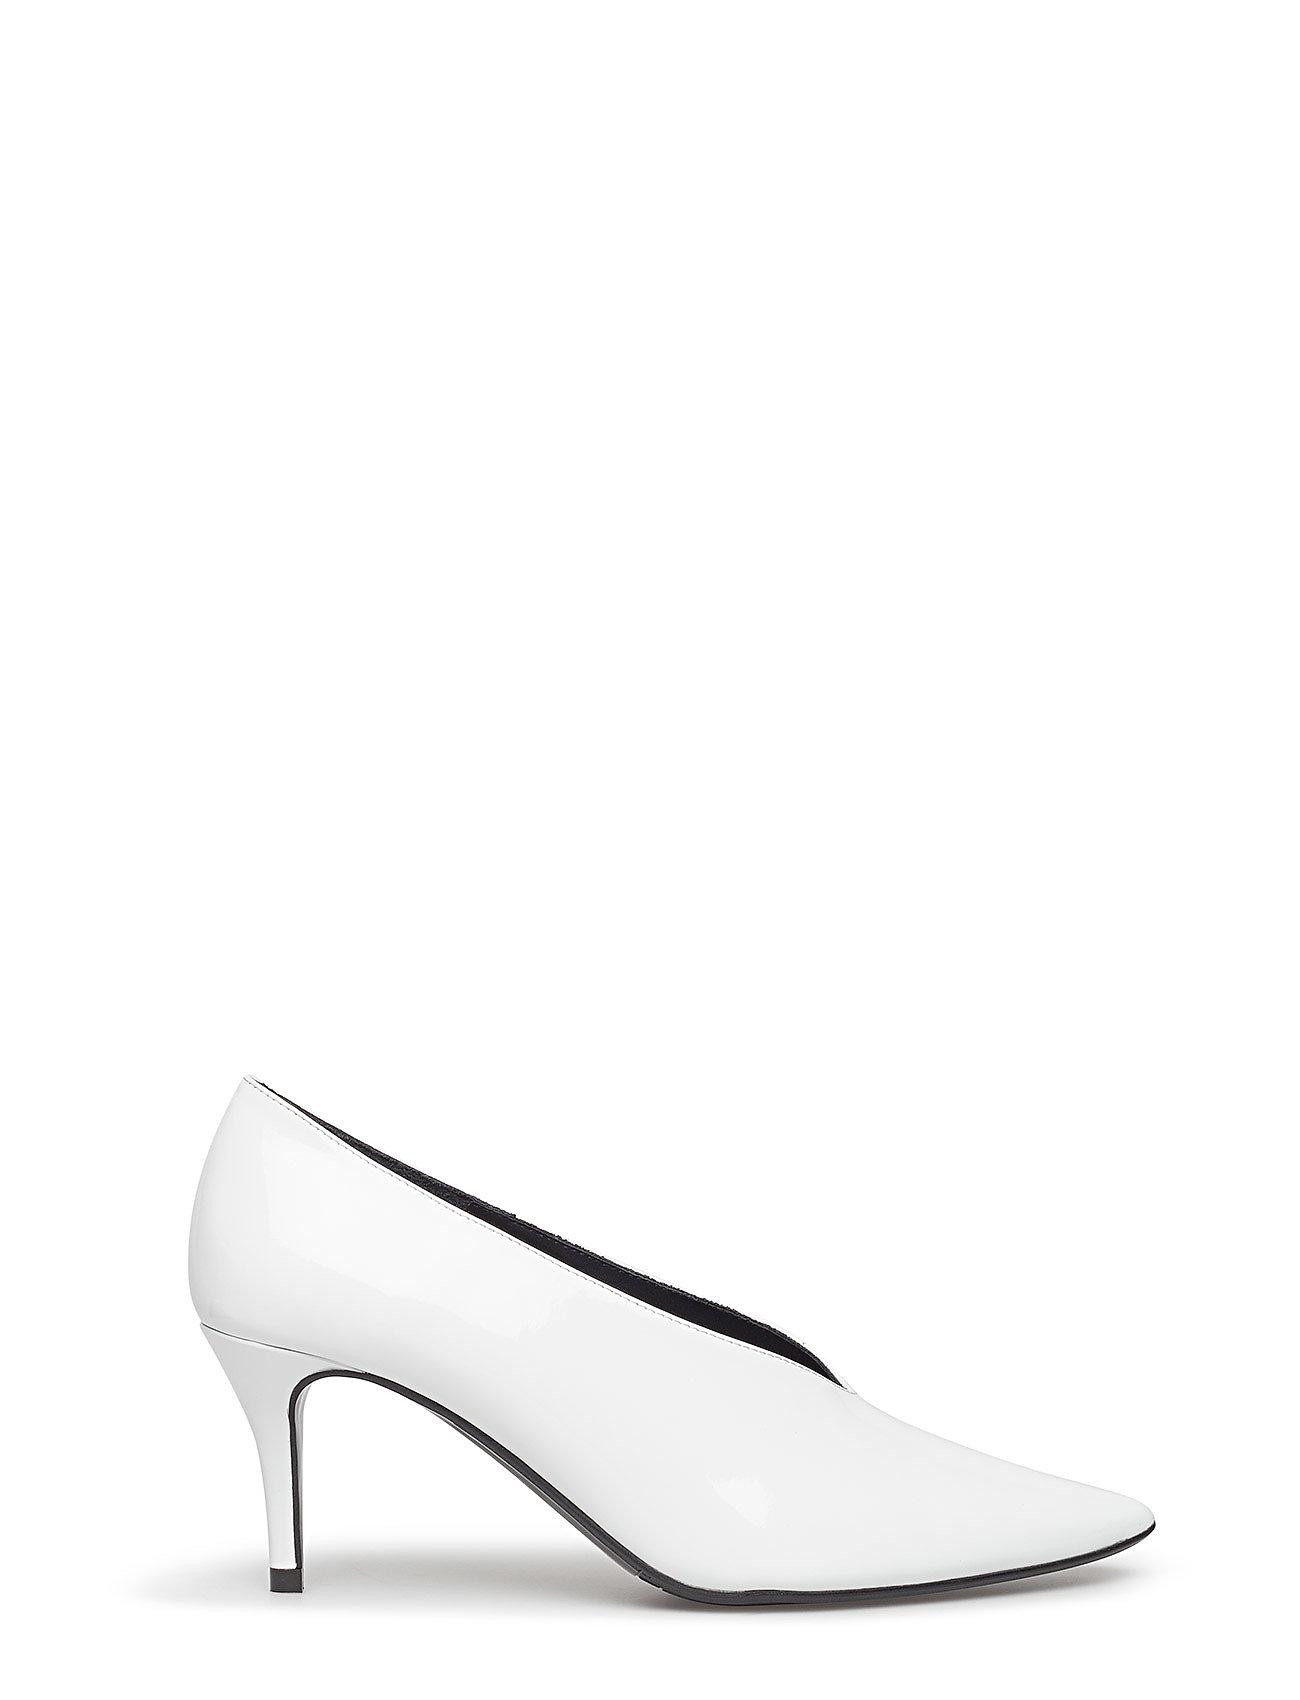 Shoeswhite Bi 220Billi Shoeswhite Shoeswhite Patent Bi Patent 220Billi 8n0OwkPXN